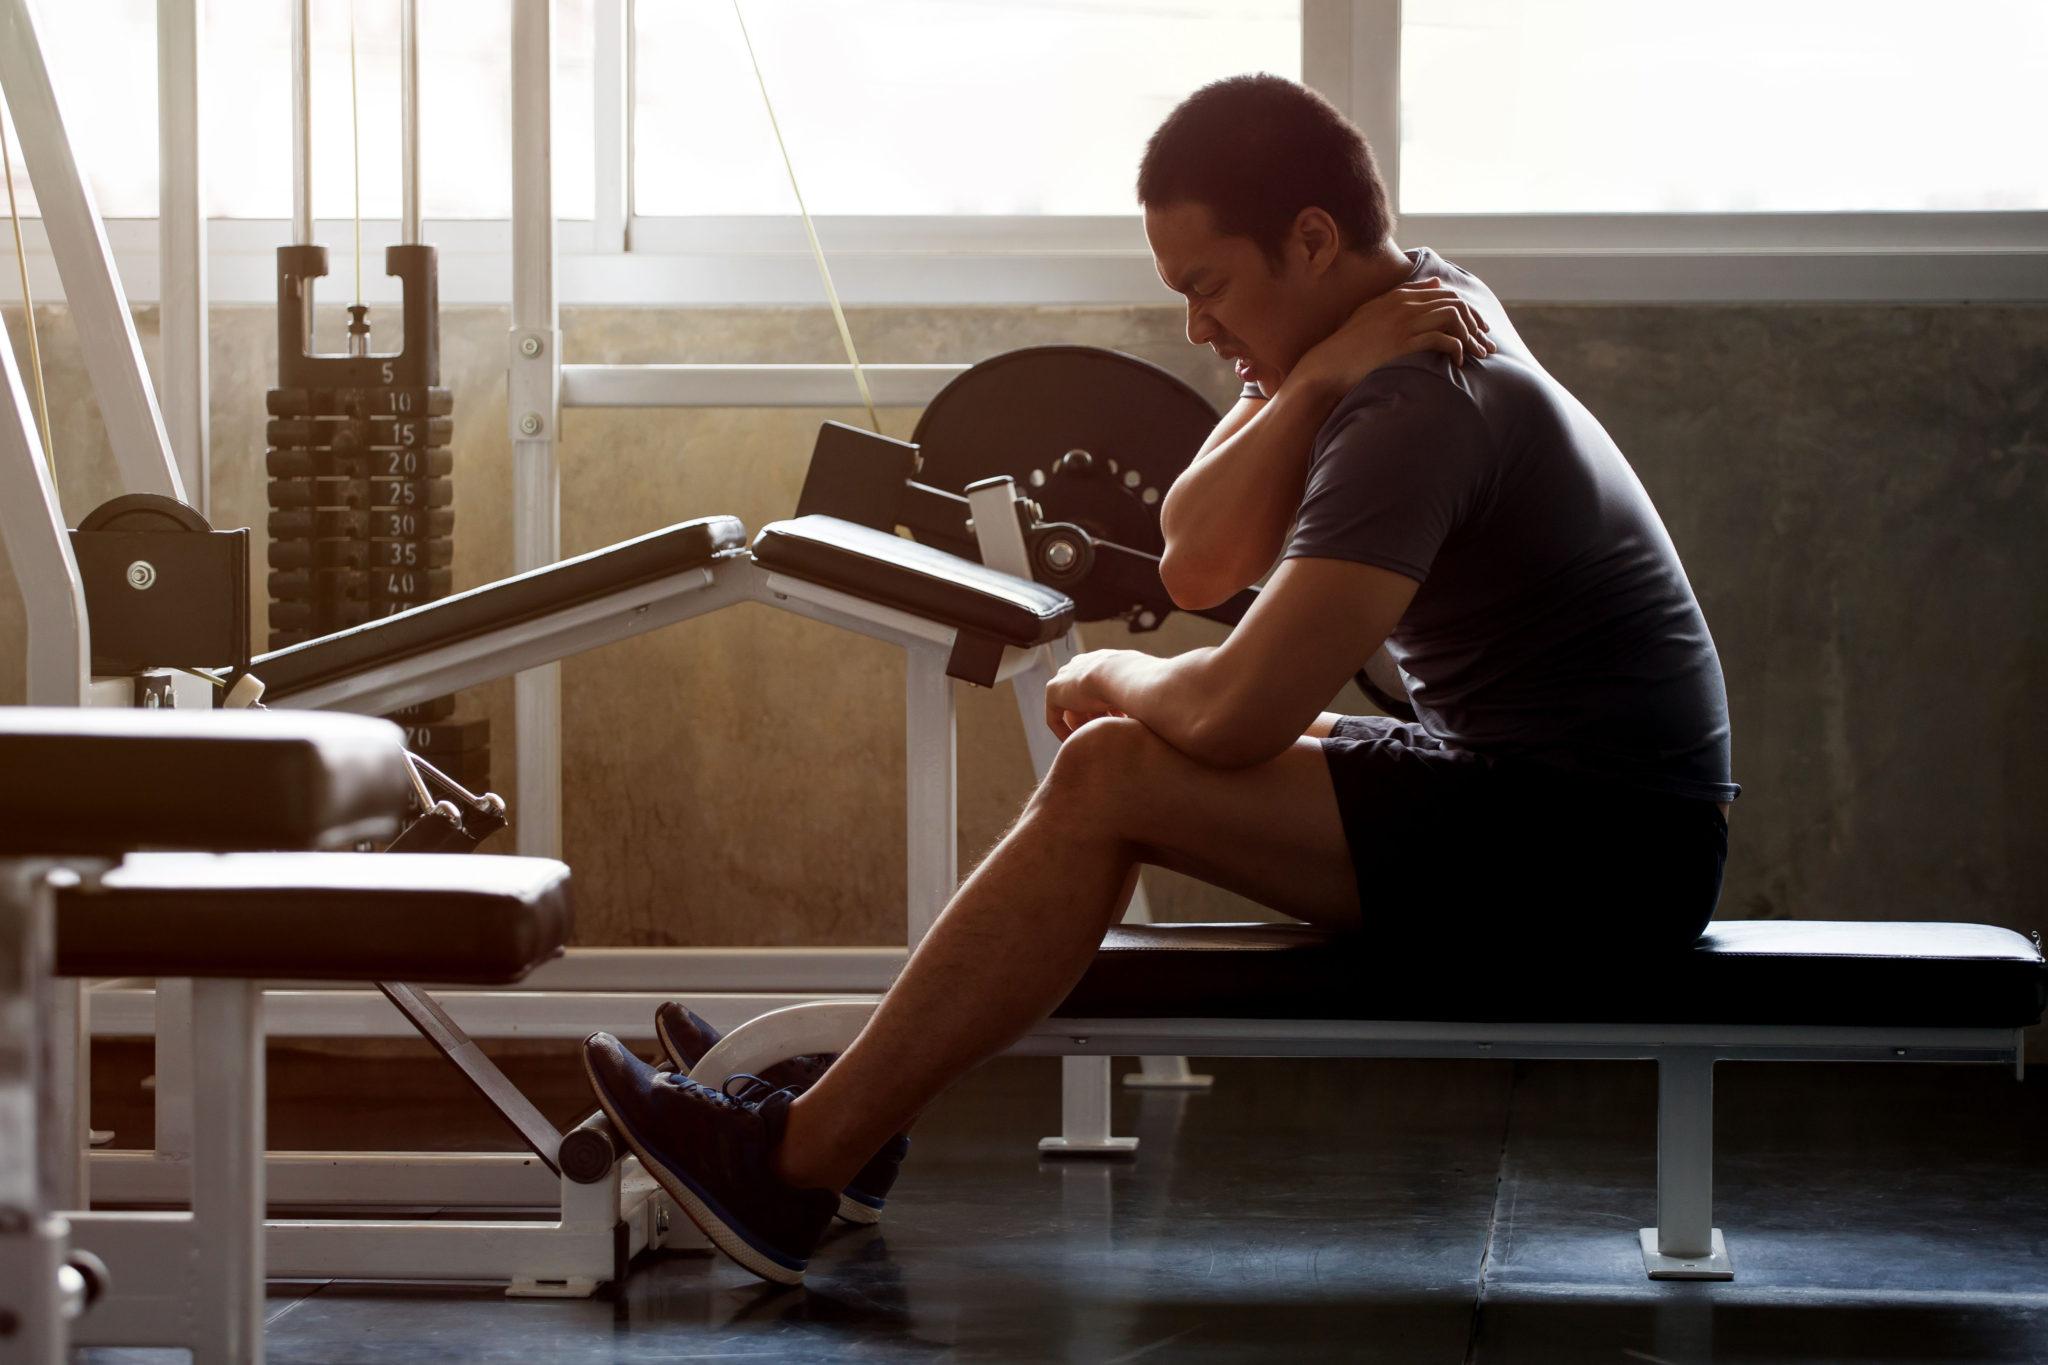 sports injury weights